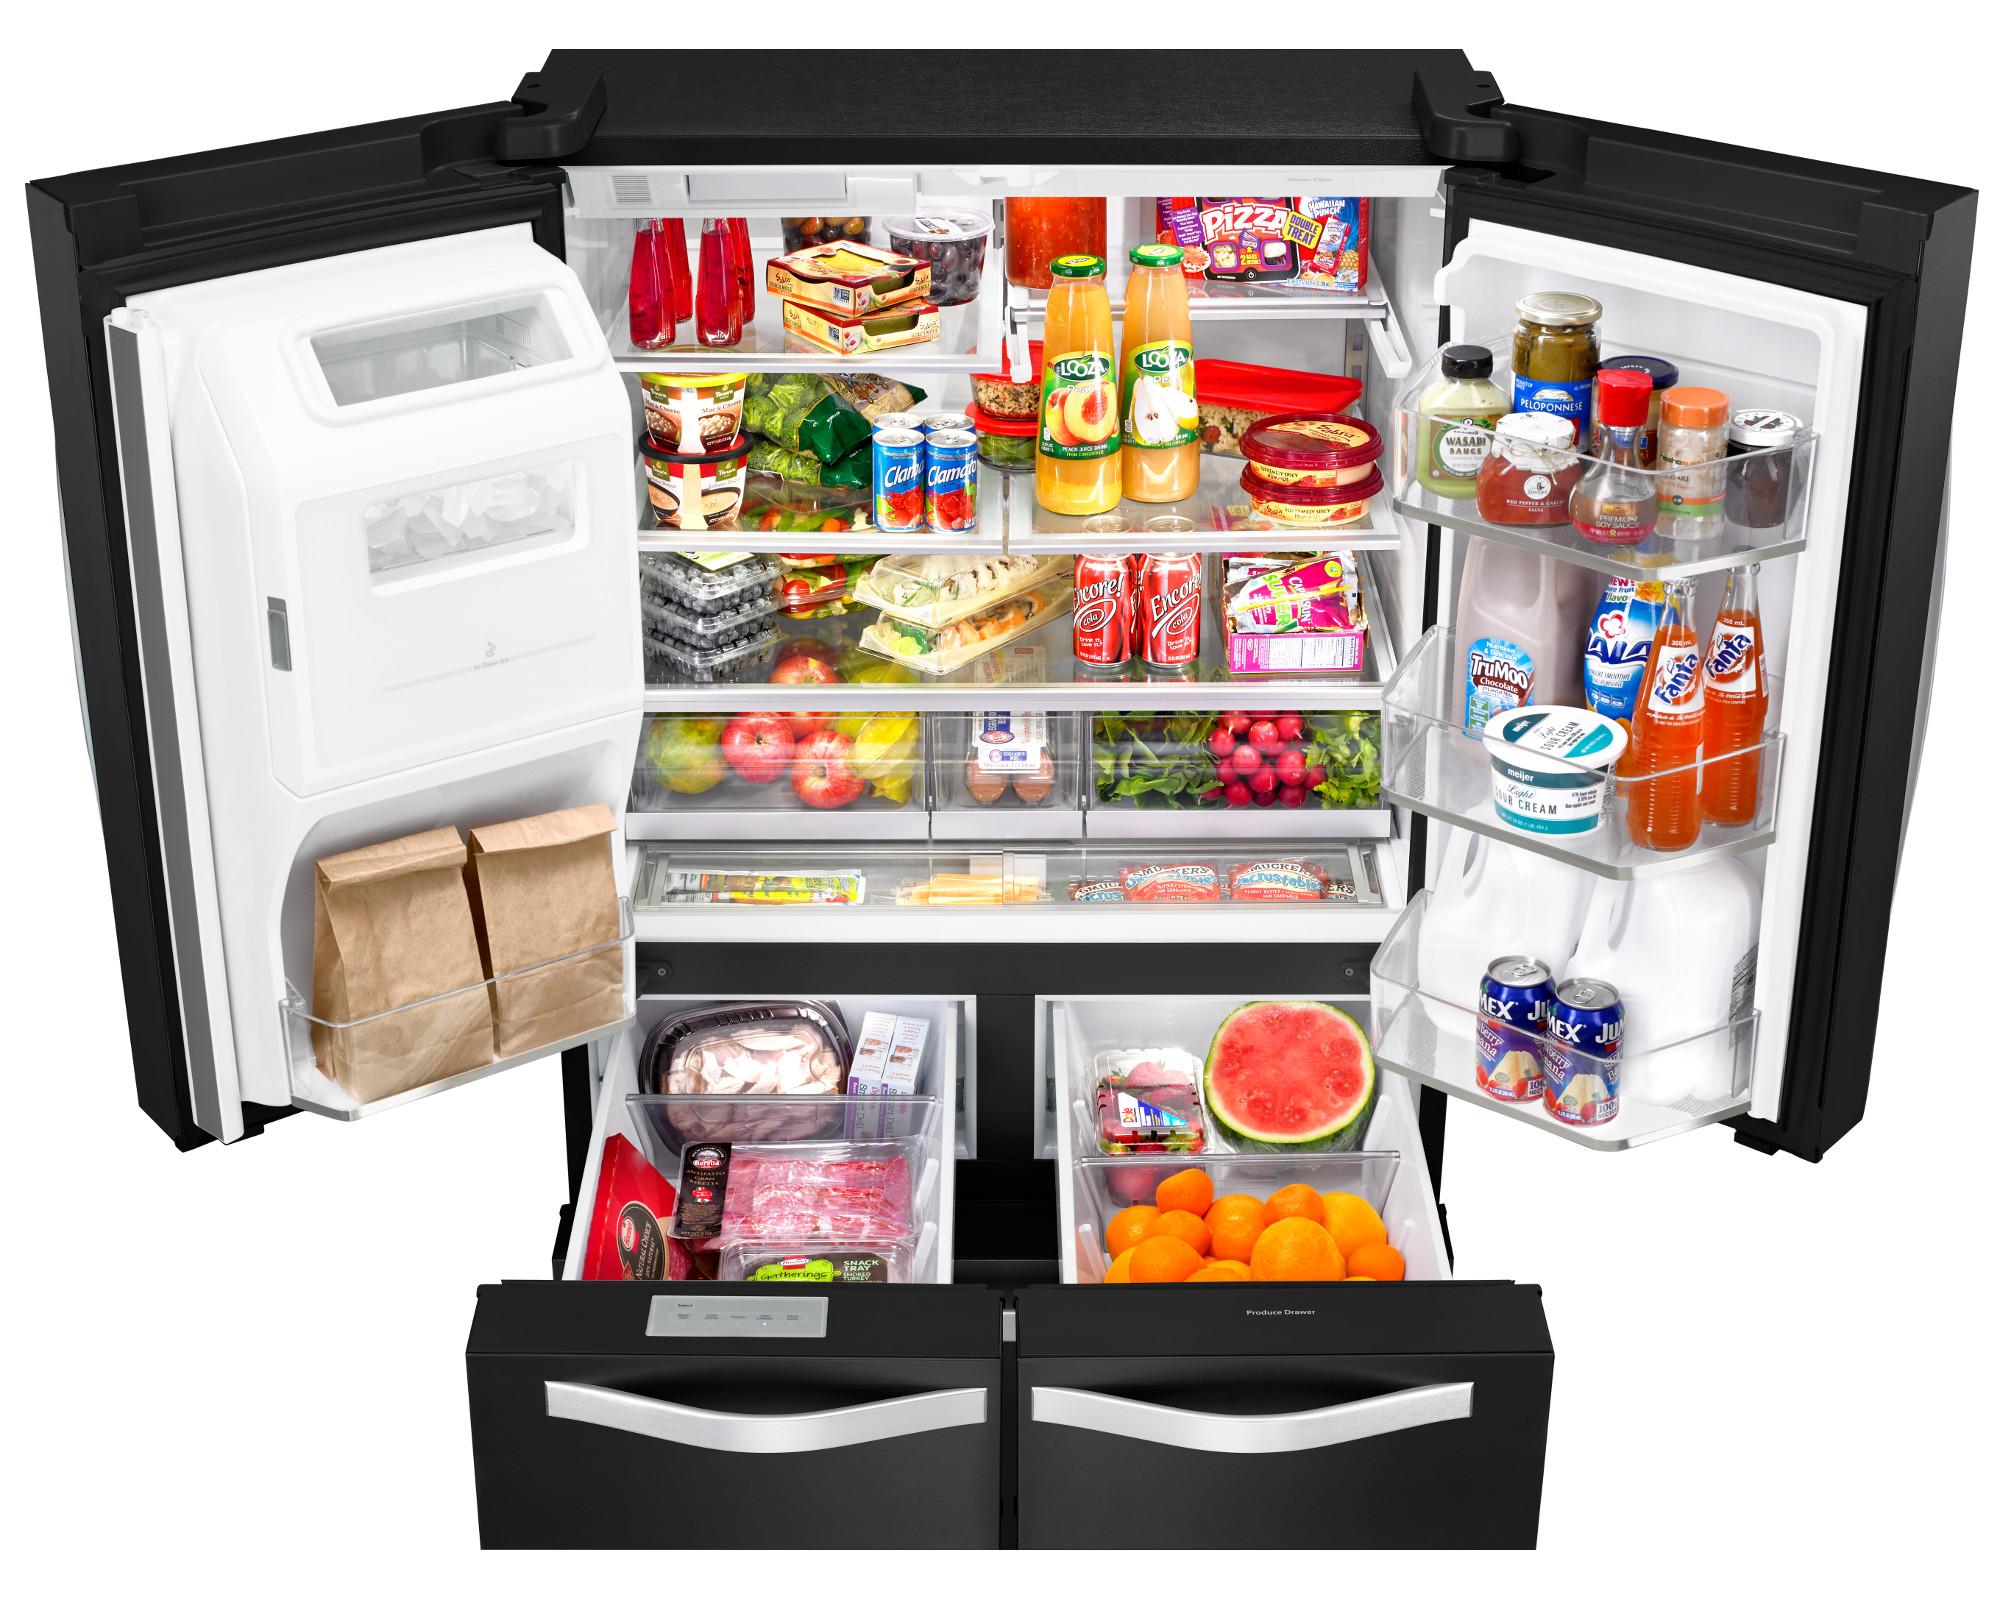 Whirlpool WRV996FDEE 26 cu. ft. French Door Bottom Freezer Refrigerator - Black